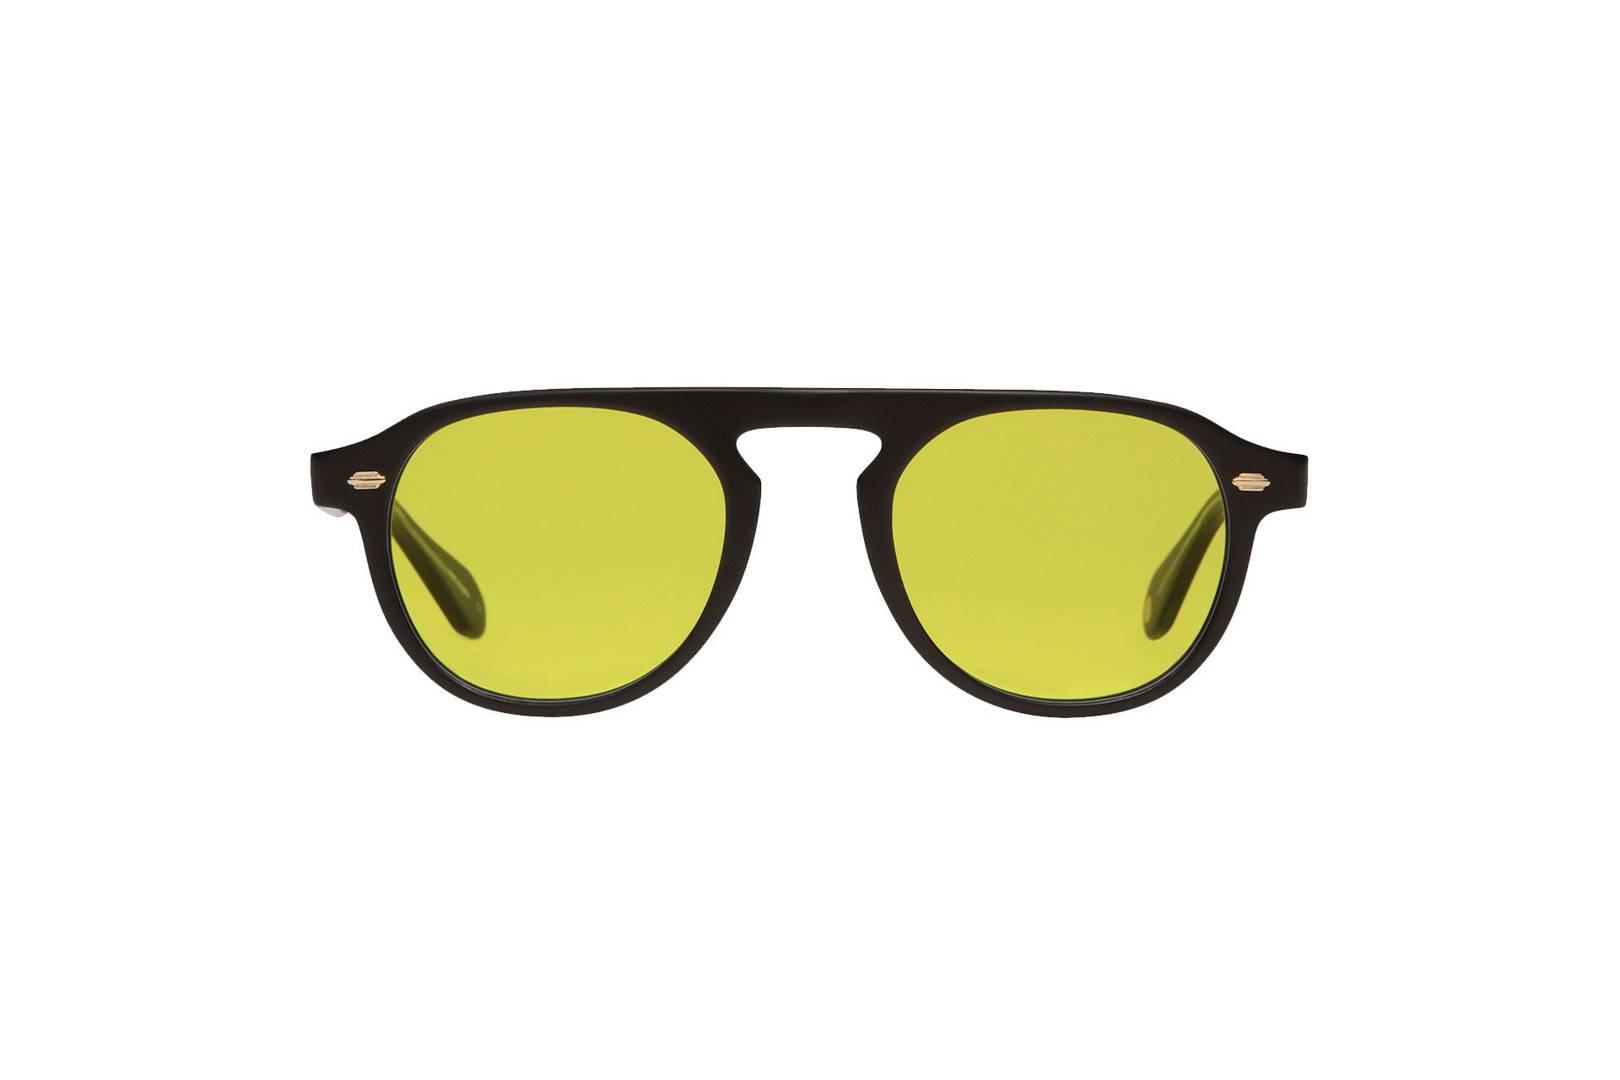 f33f66098f0 Yellow Lens Sunglasses  The Vogue Edit